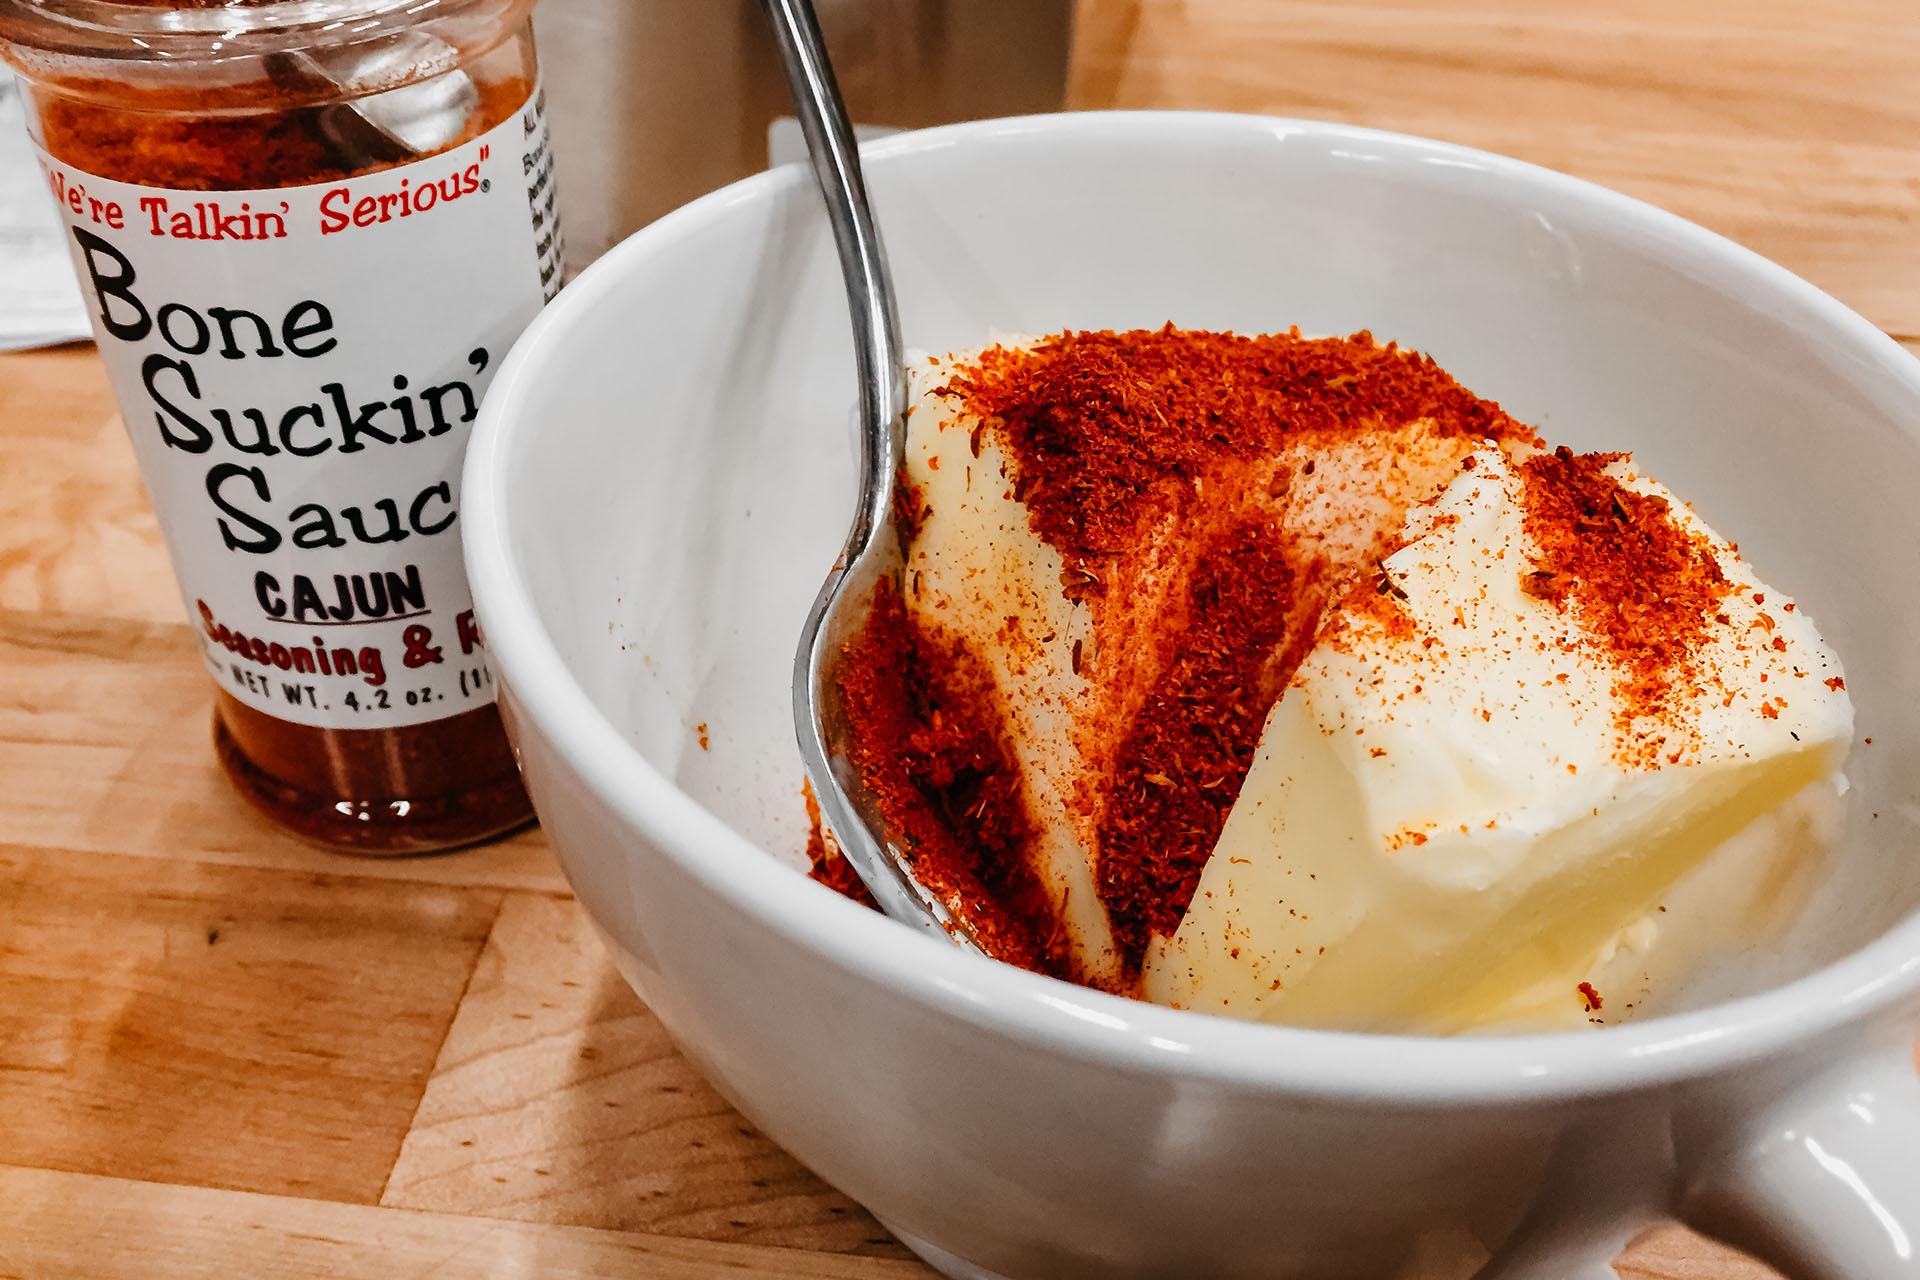 Bone Suckin' Cajun Butter